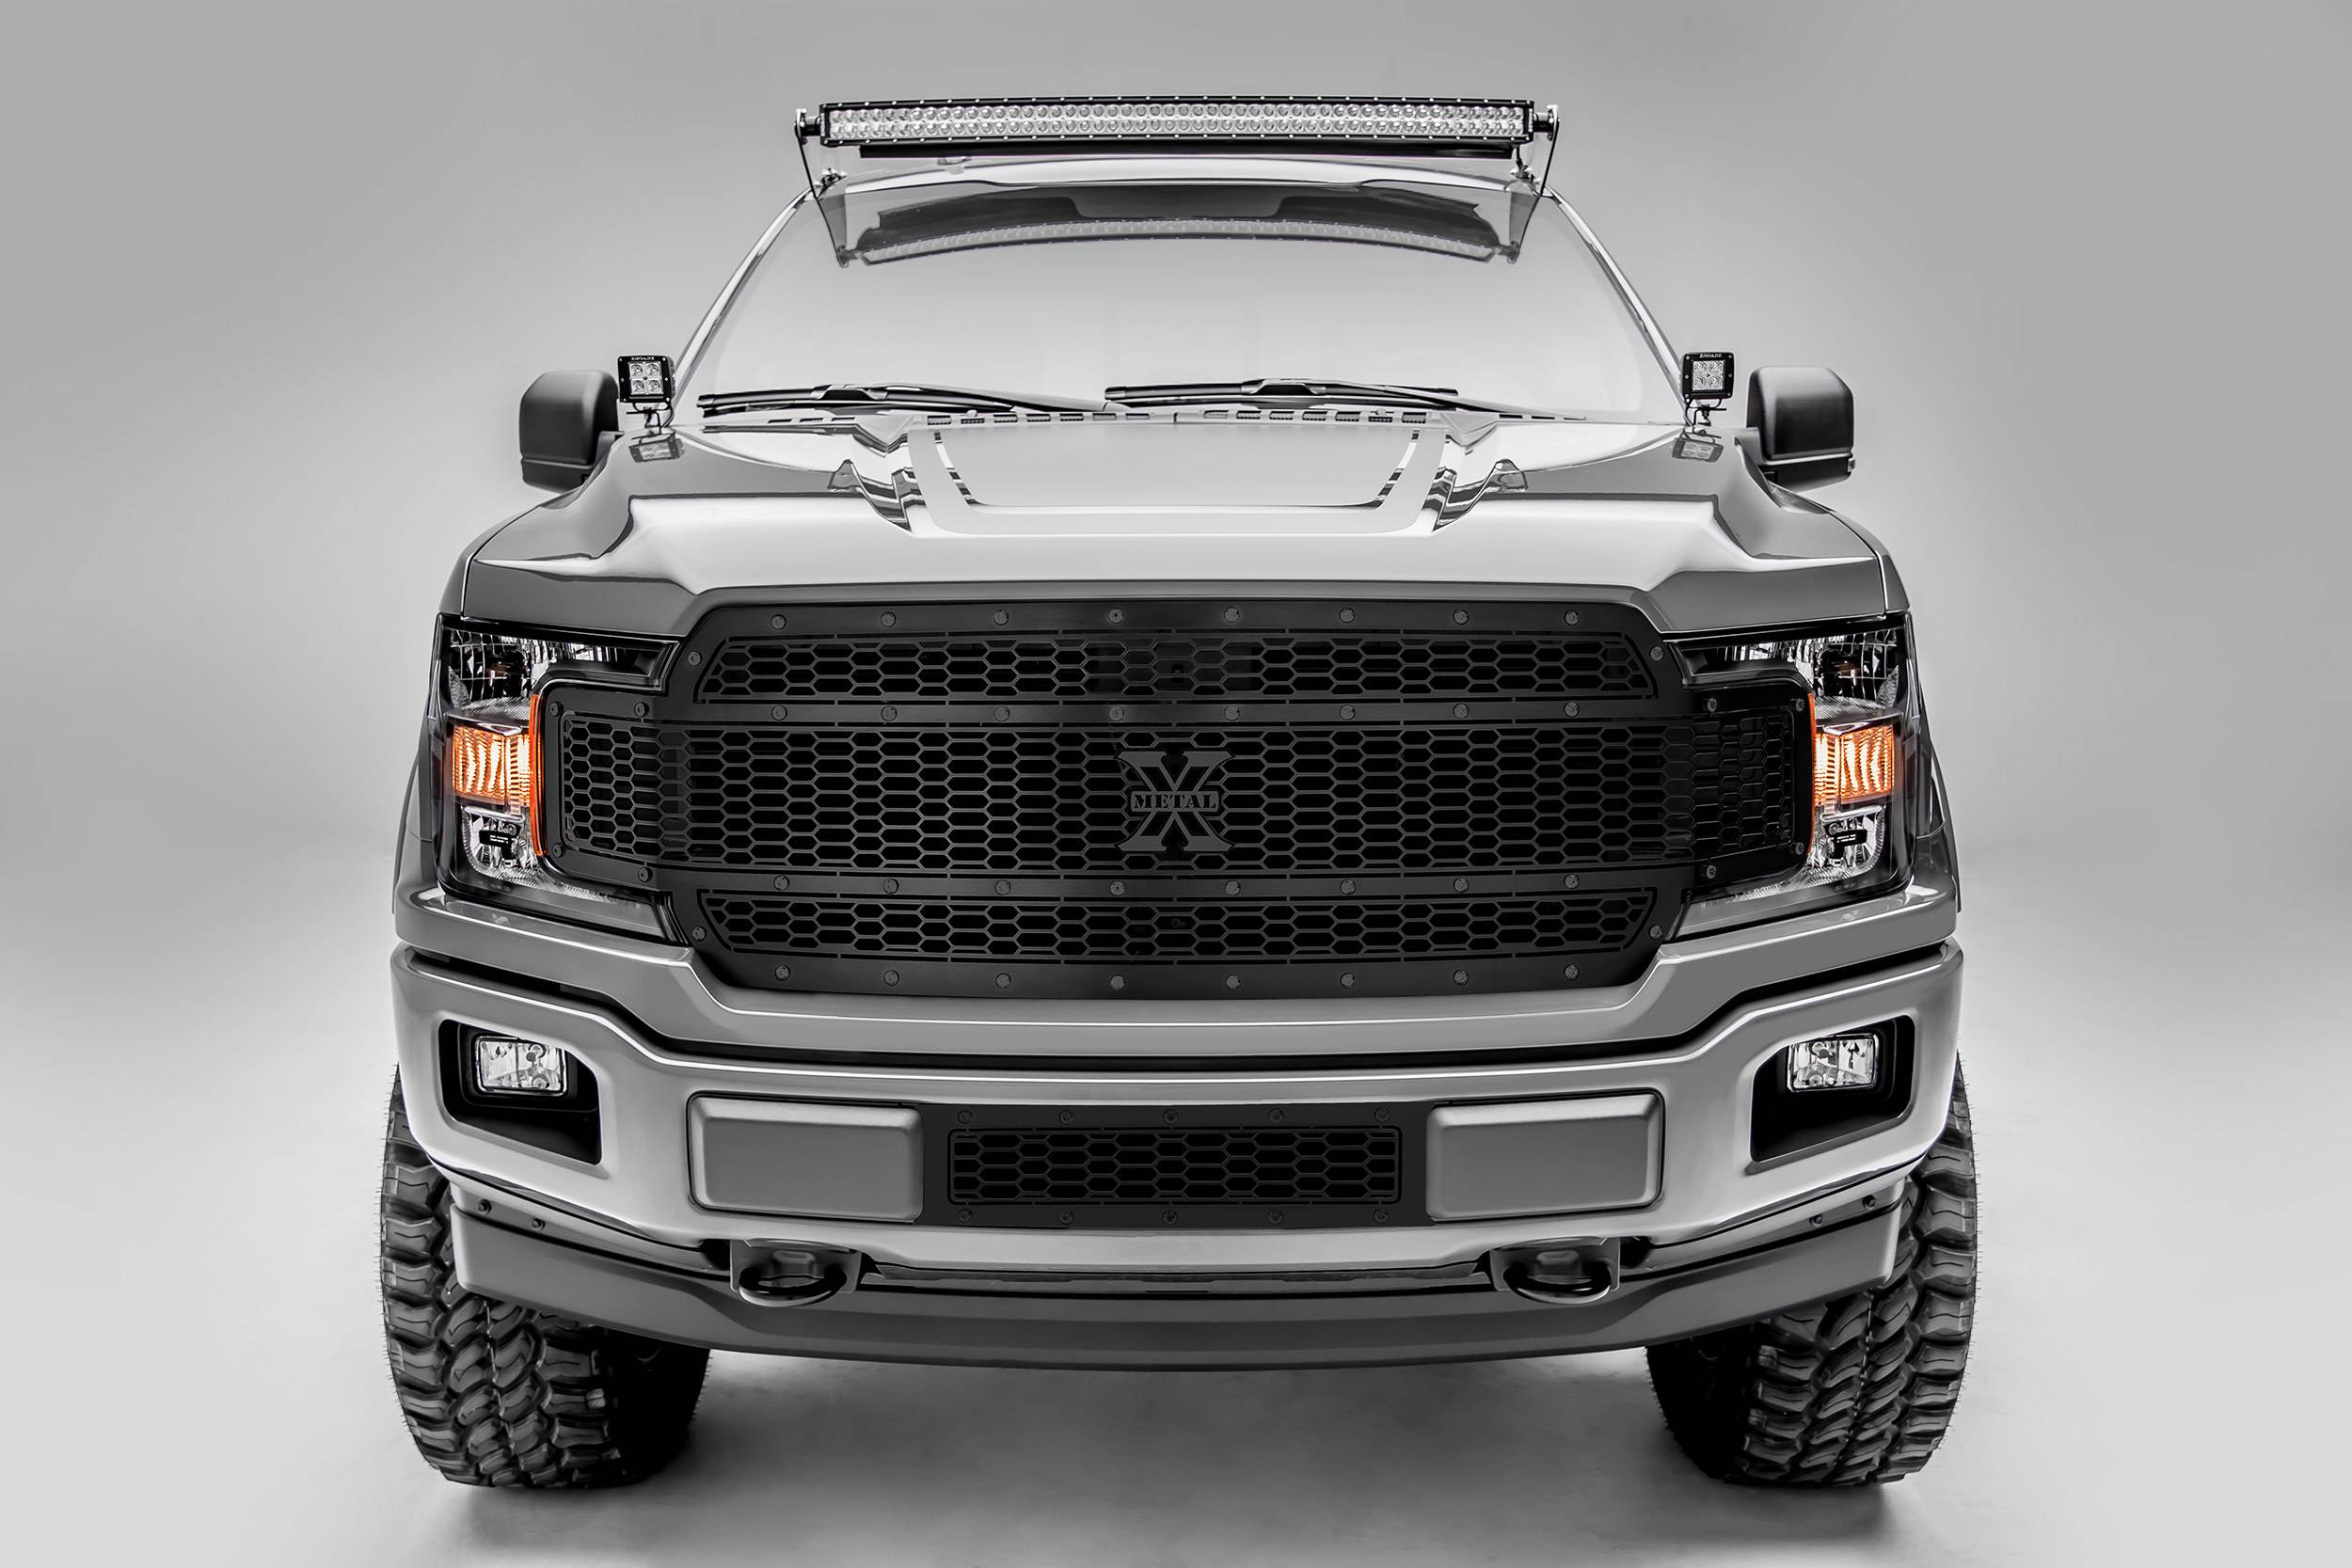 T-REX Grilles - 2018-2020 F-150 Stealth Laser X Grille, Black, 1 Pc, Replacement, Black Studs - PN #7715841-BR